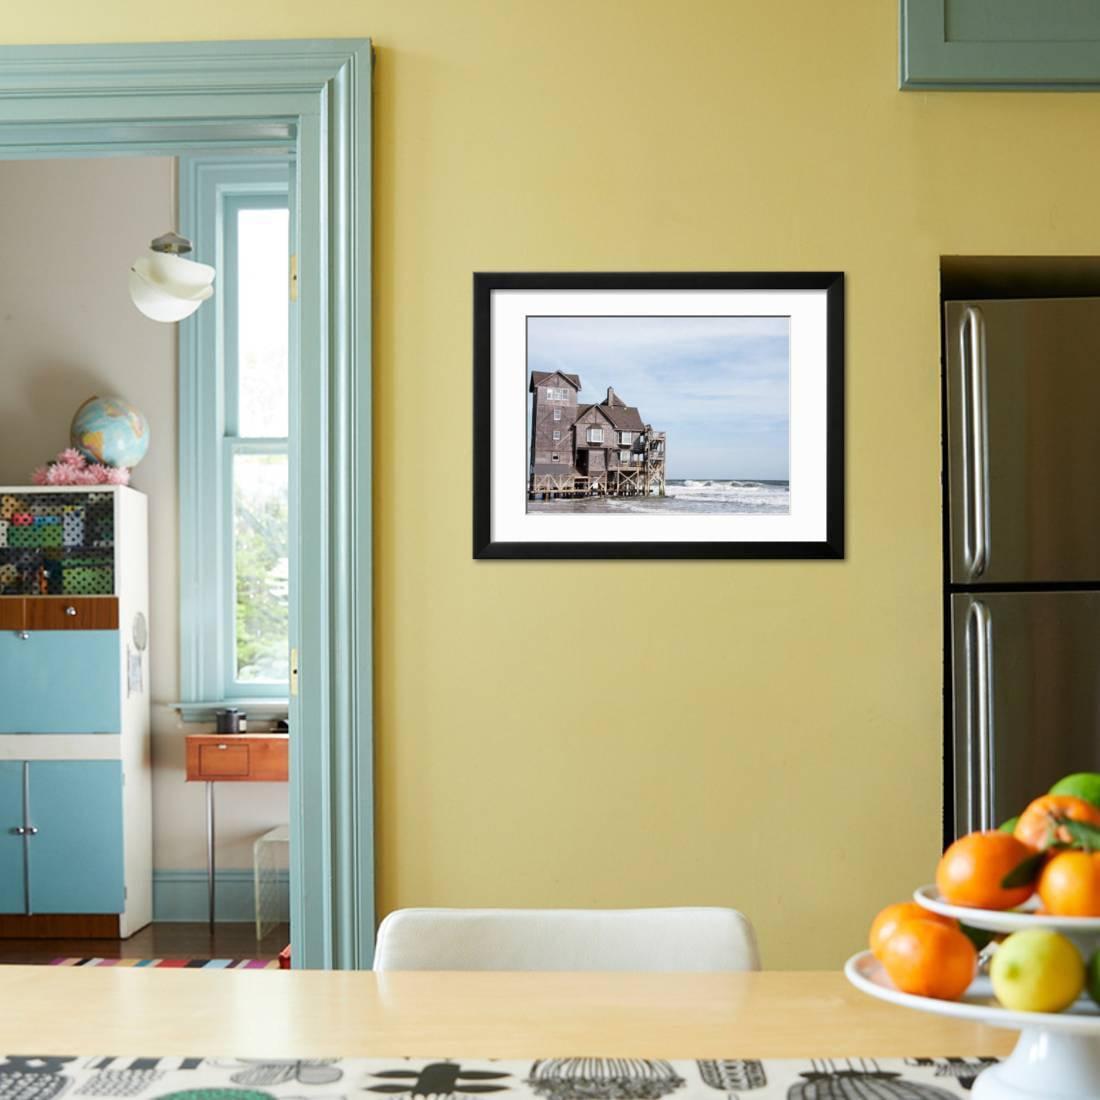 Nights in Rodanthe Movie House Vacation Rental - Coastal Decor Ideas  Interior Design DIY Shopping